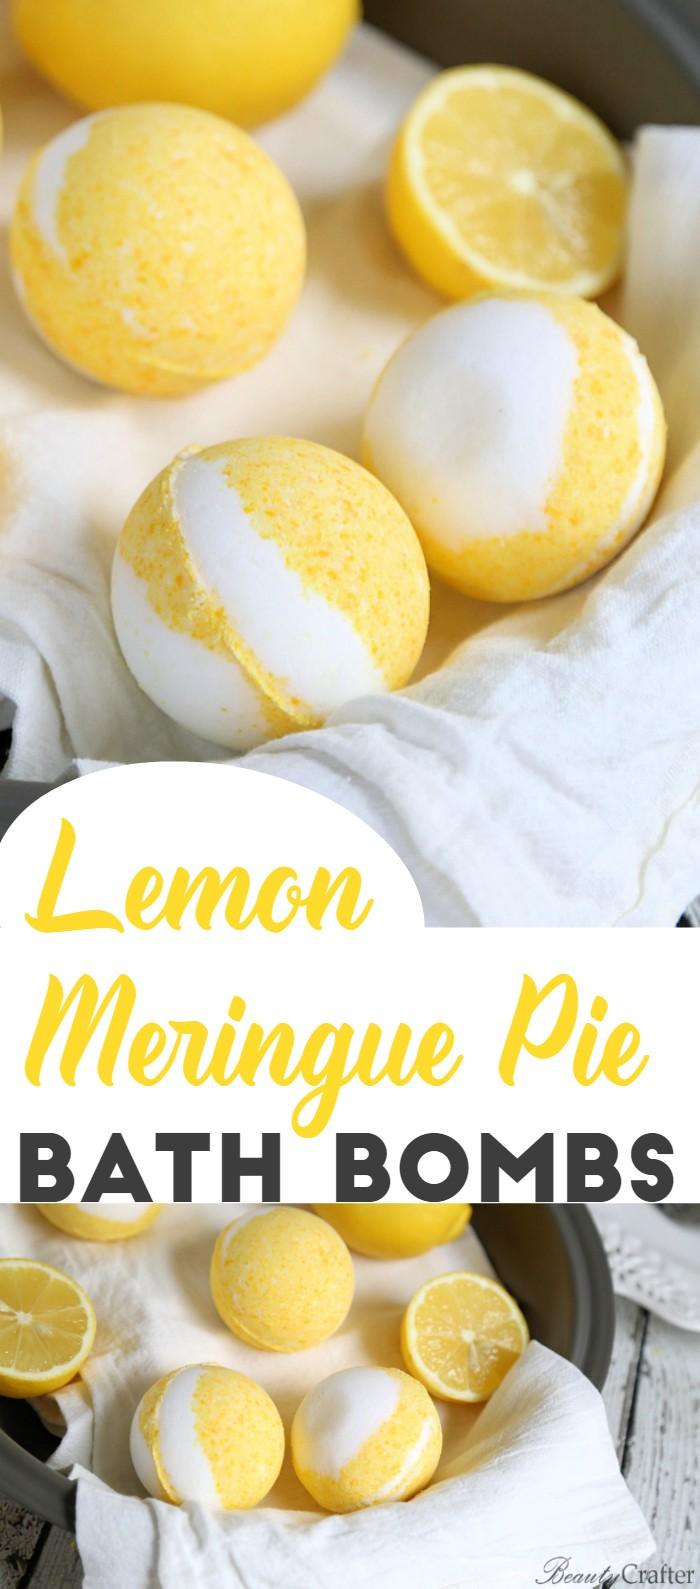 Lemon Meringue Pie bath Bombs - DIY Vanilla lemon bath bomb recipe that smells so delicious!